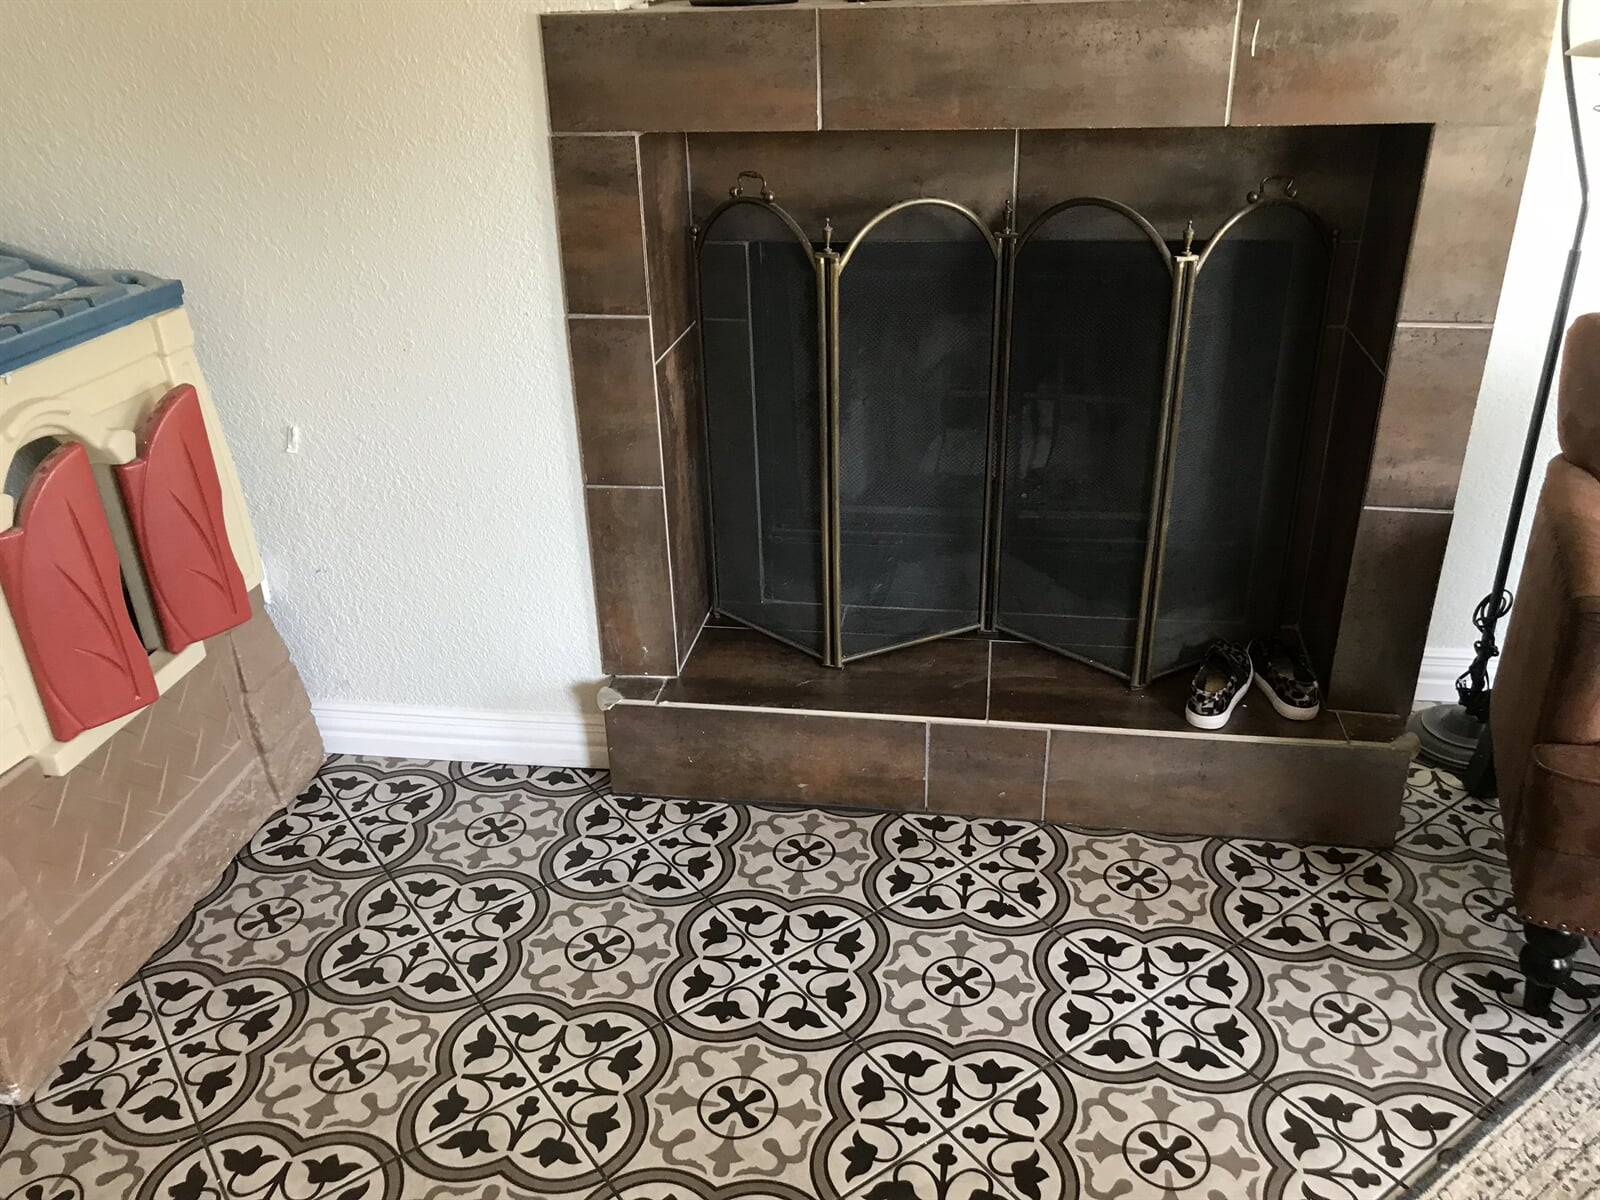 New patterned tile flooring